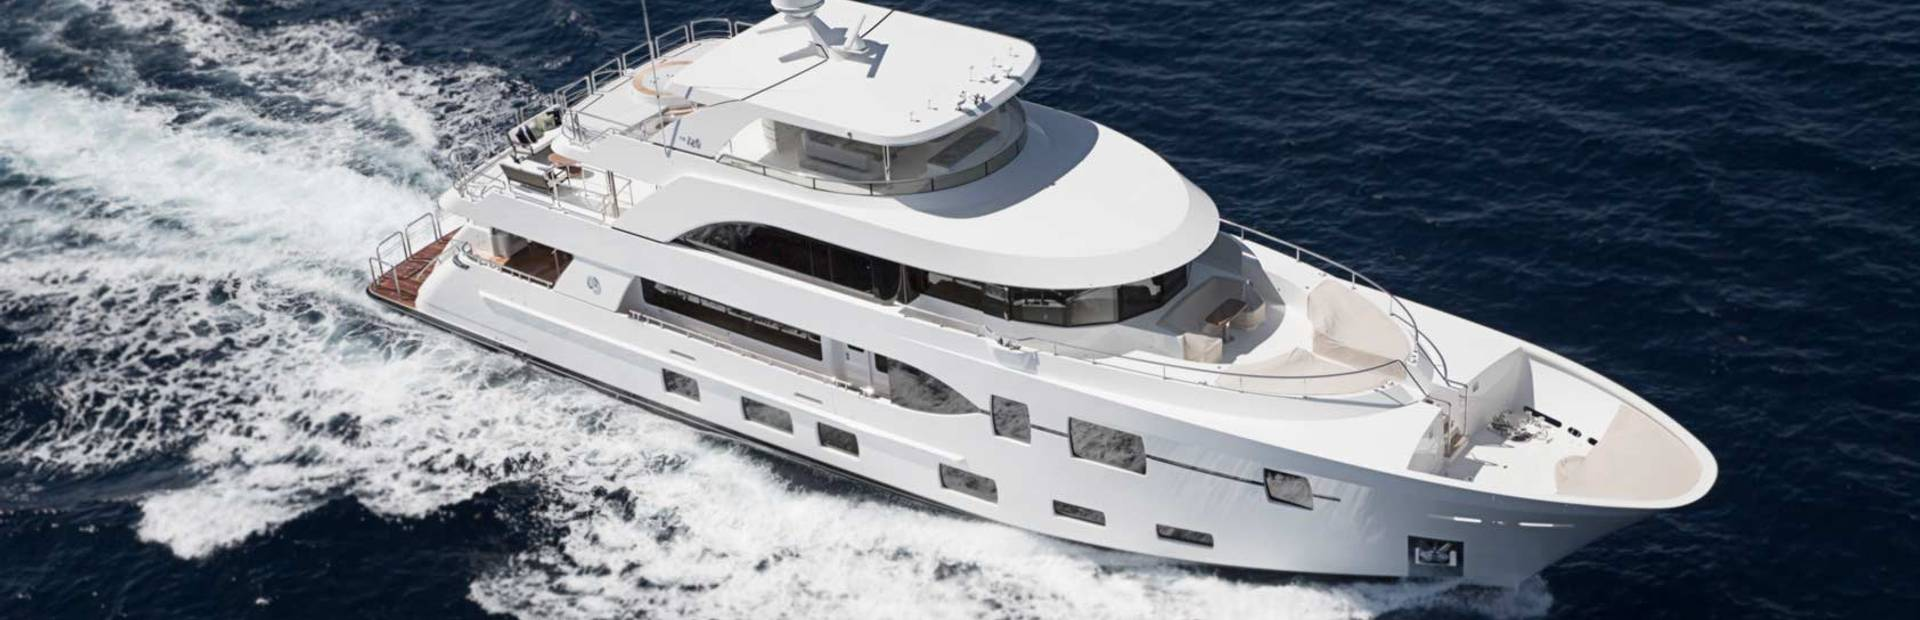 120 Megayacht Yacht Charter